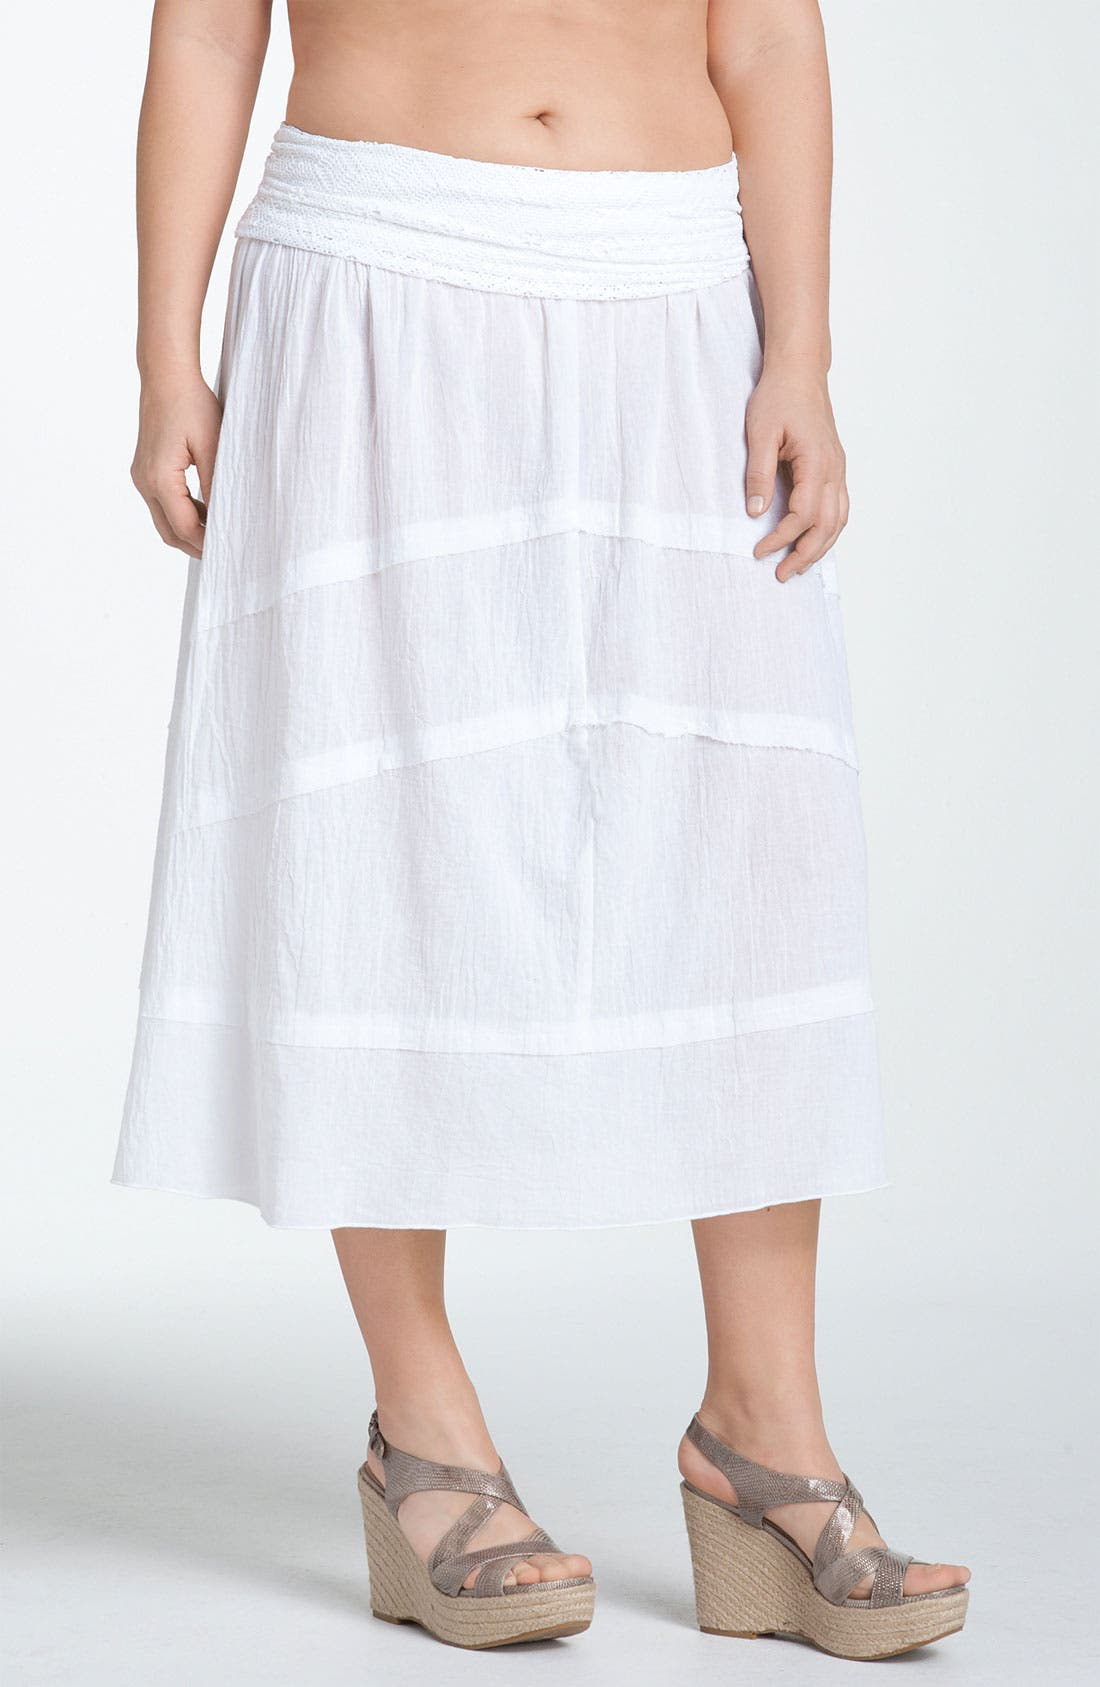 Alternate Image 2  - Becca 'Lighten Up' Convertible Cover-Up Dress (Plus)